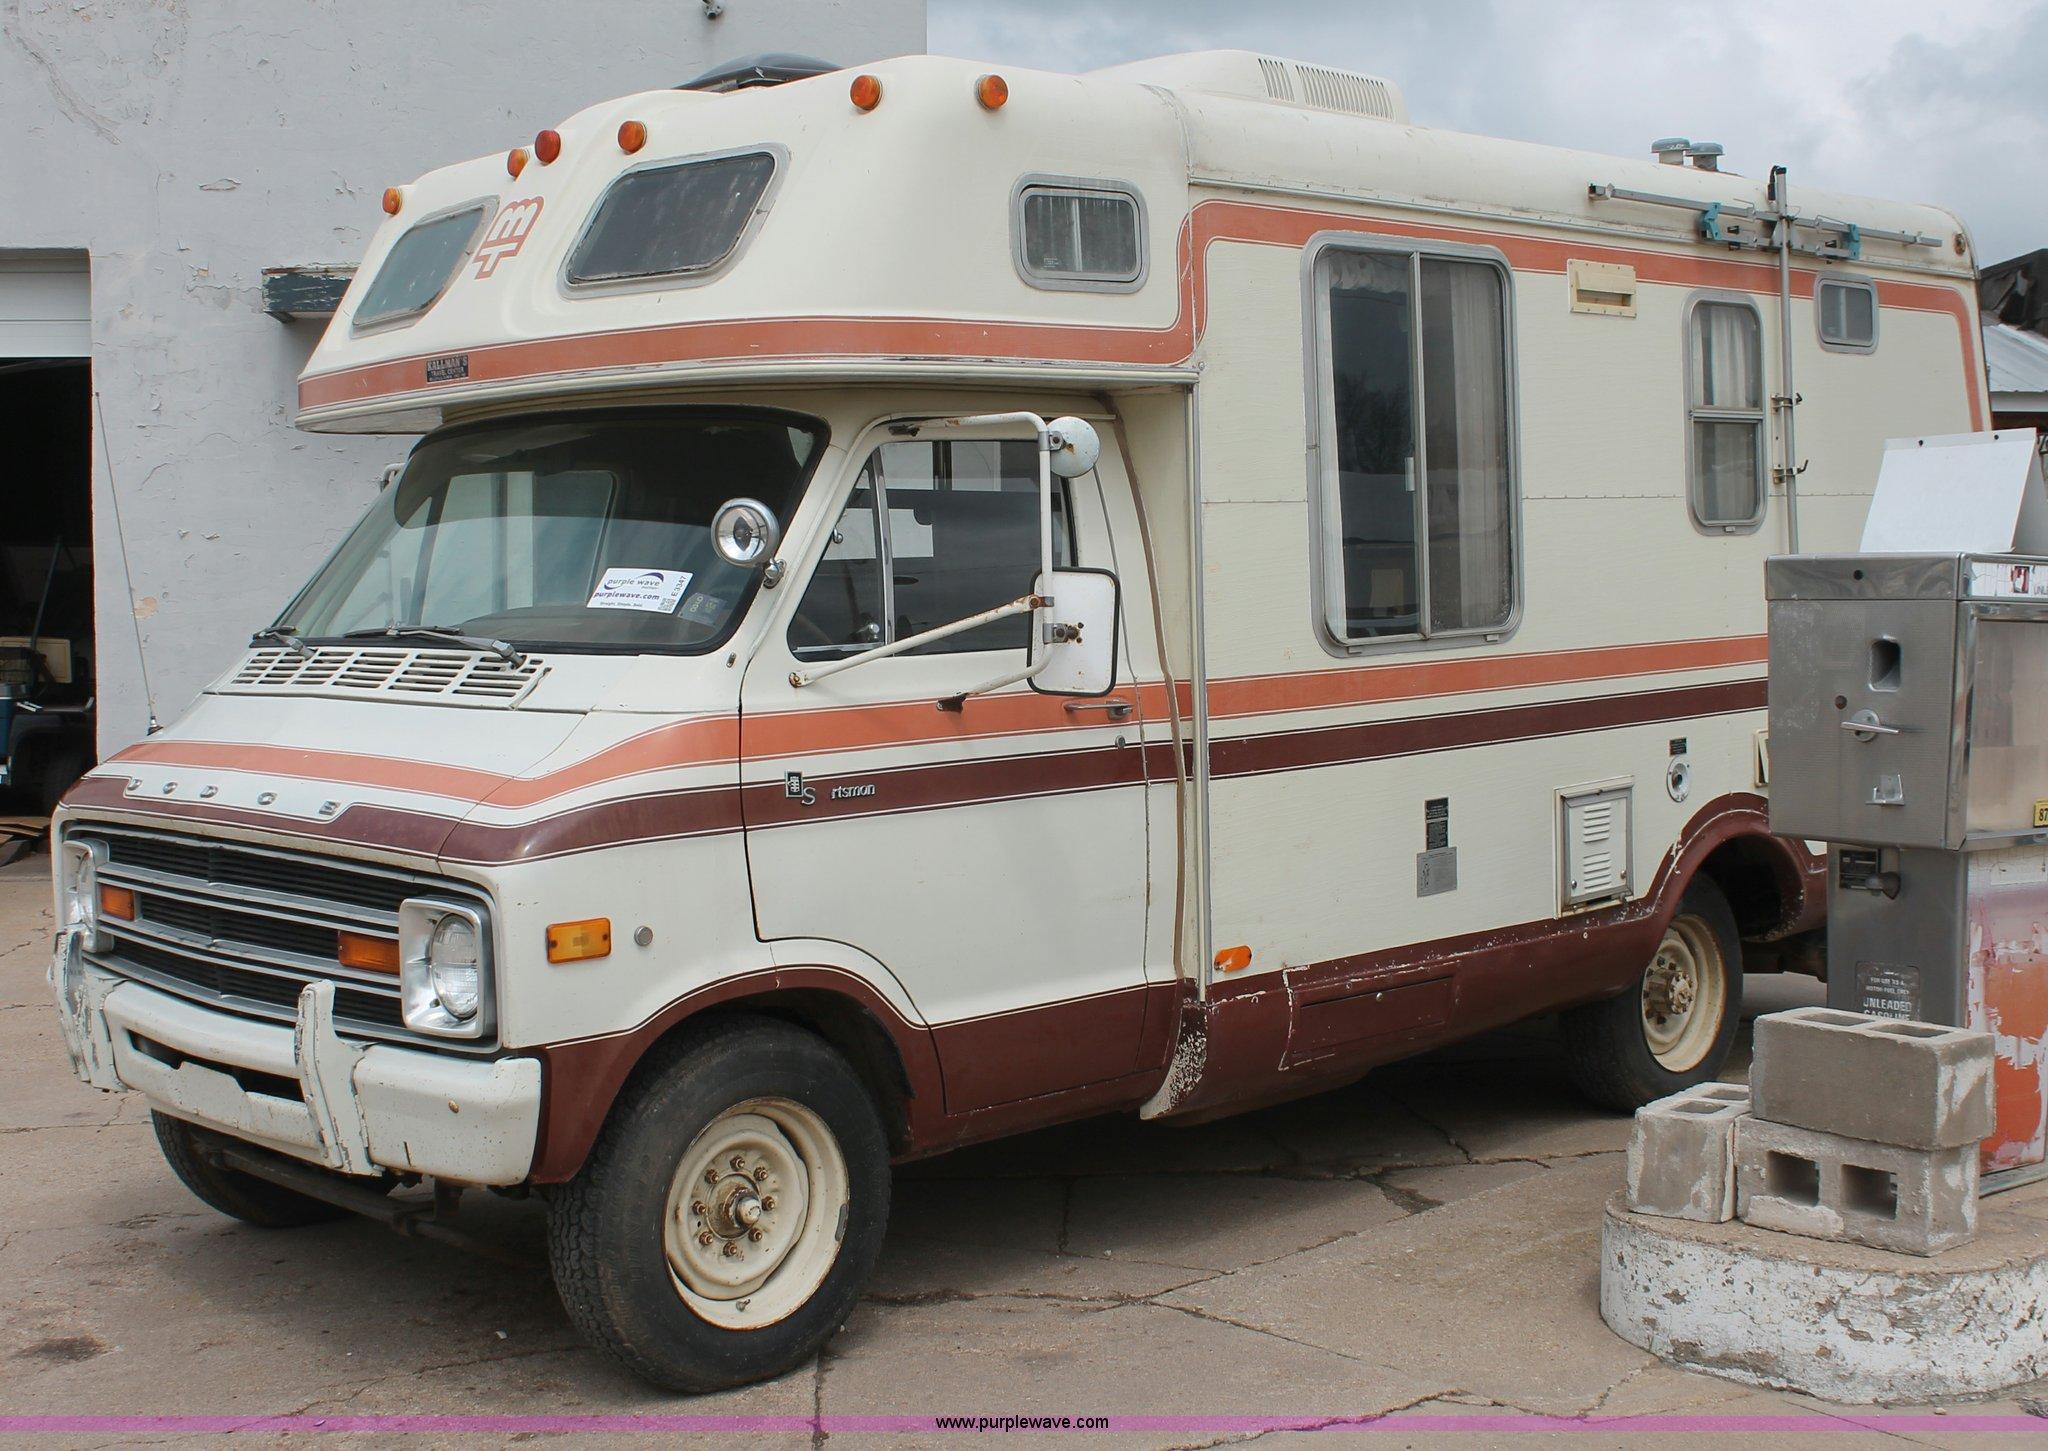 1978 Dodge F30 Sportsman Mobile Traveler Camper Item E3347 1976 Rv Wiring Diagram Full Size In New Window